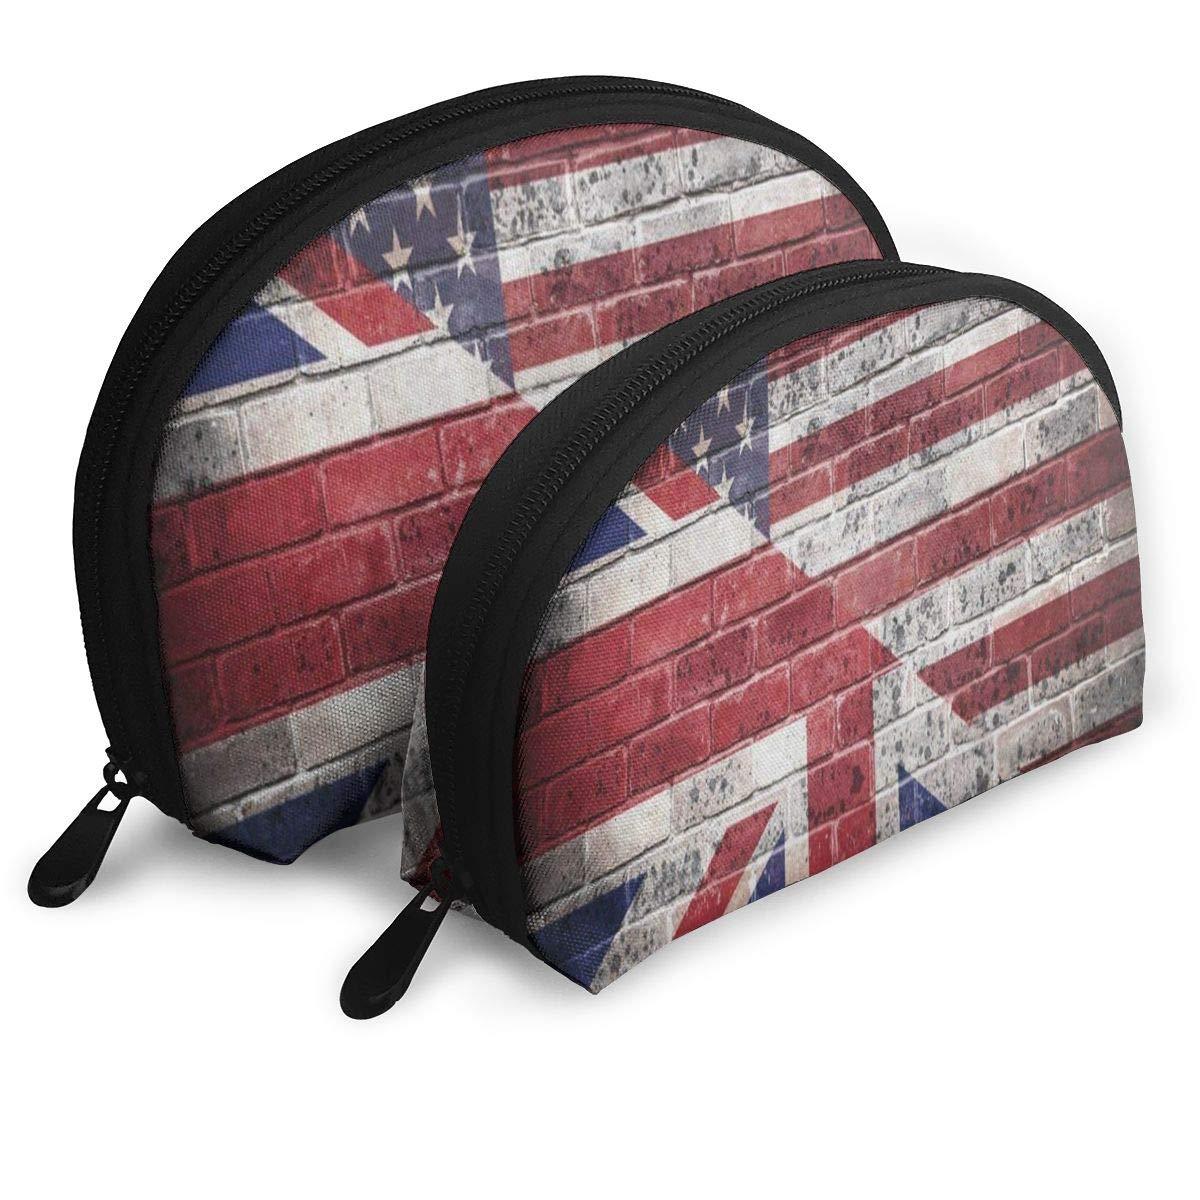 04637cb446e6 Amazon.com   Makeup Bag Vinatge Spaniel Dog In Pirate Hat Sugar Skull Handy  Shell Travel Bags Case For Women   Beauty